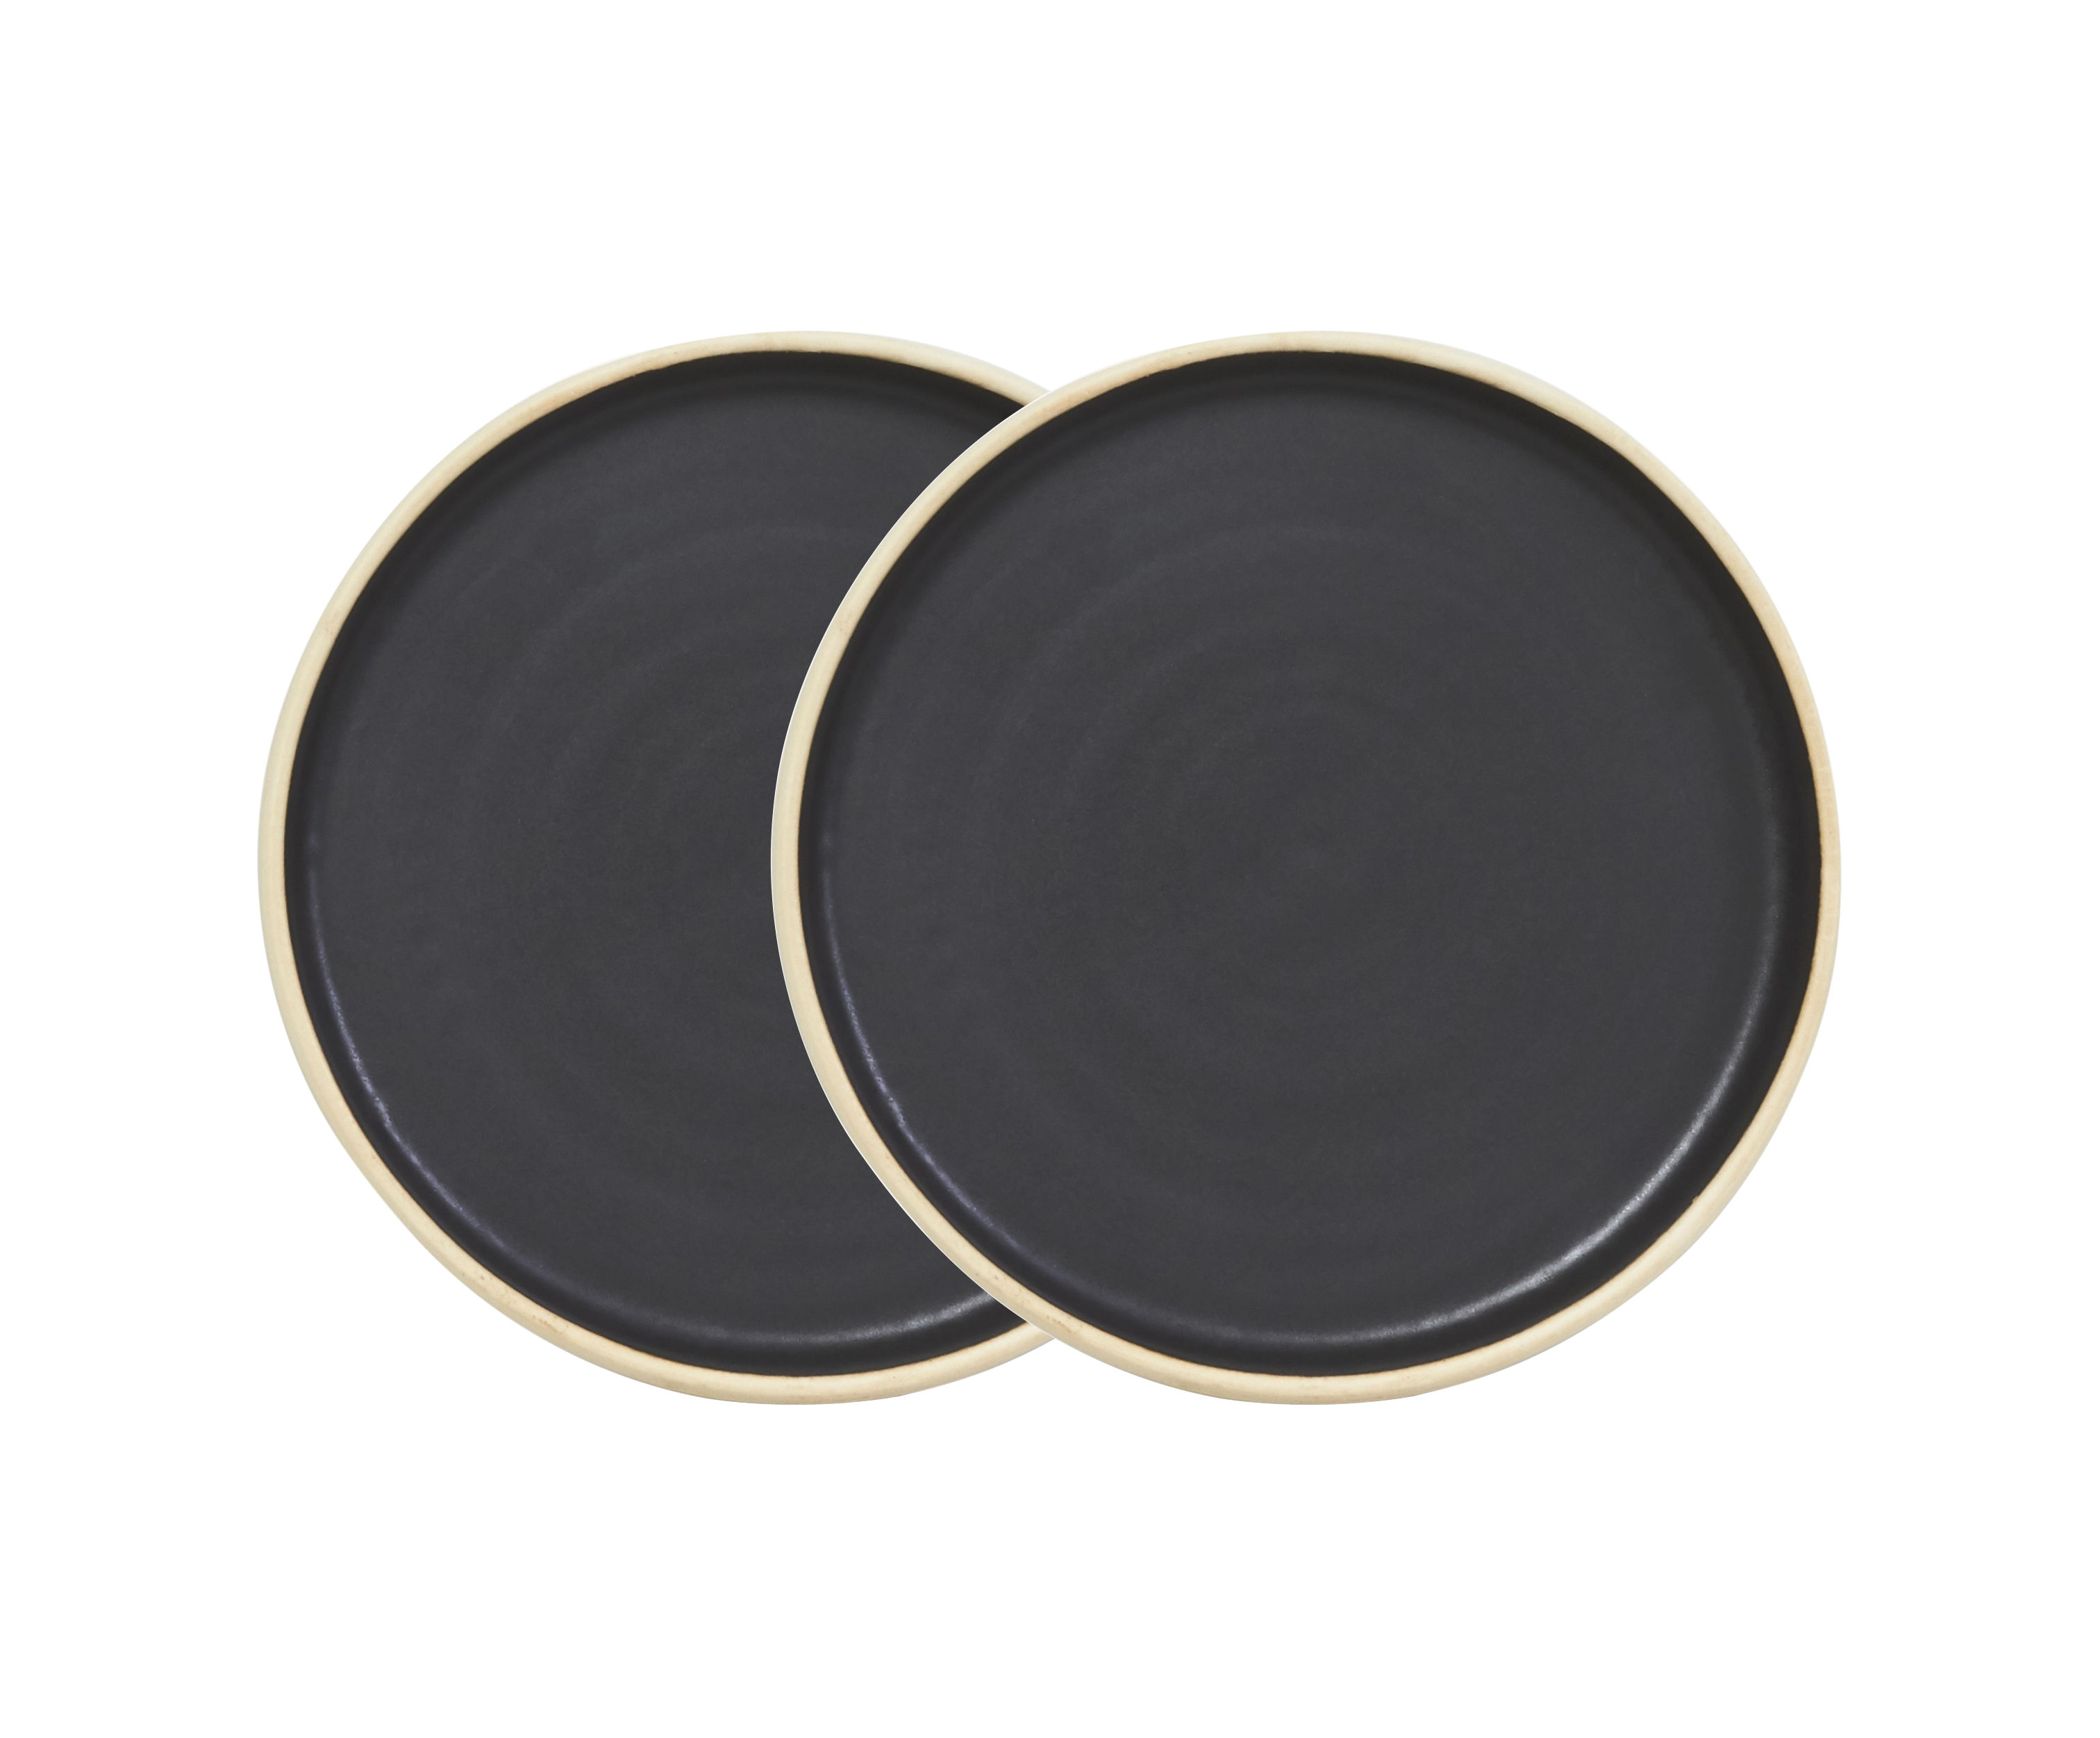 Tableware - Plates - Otto Dessert plate - / Set of 2 - Ø 19 cm by Frama  - Black - Enamelled sandstone